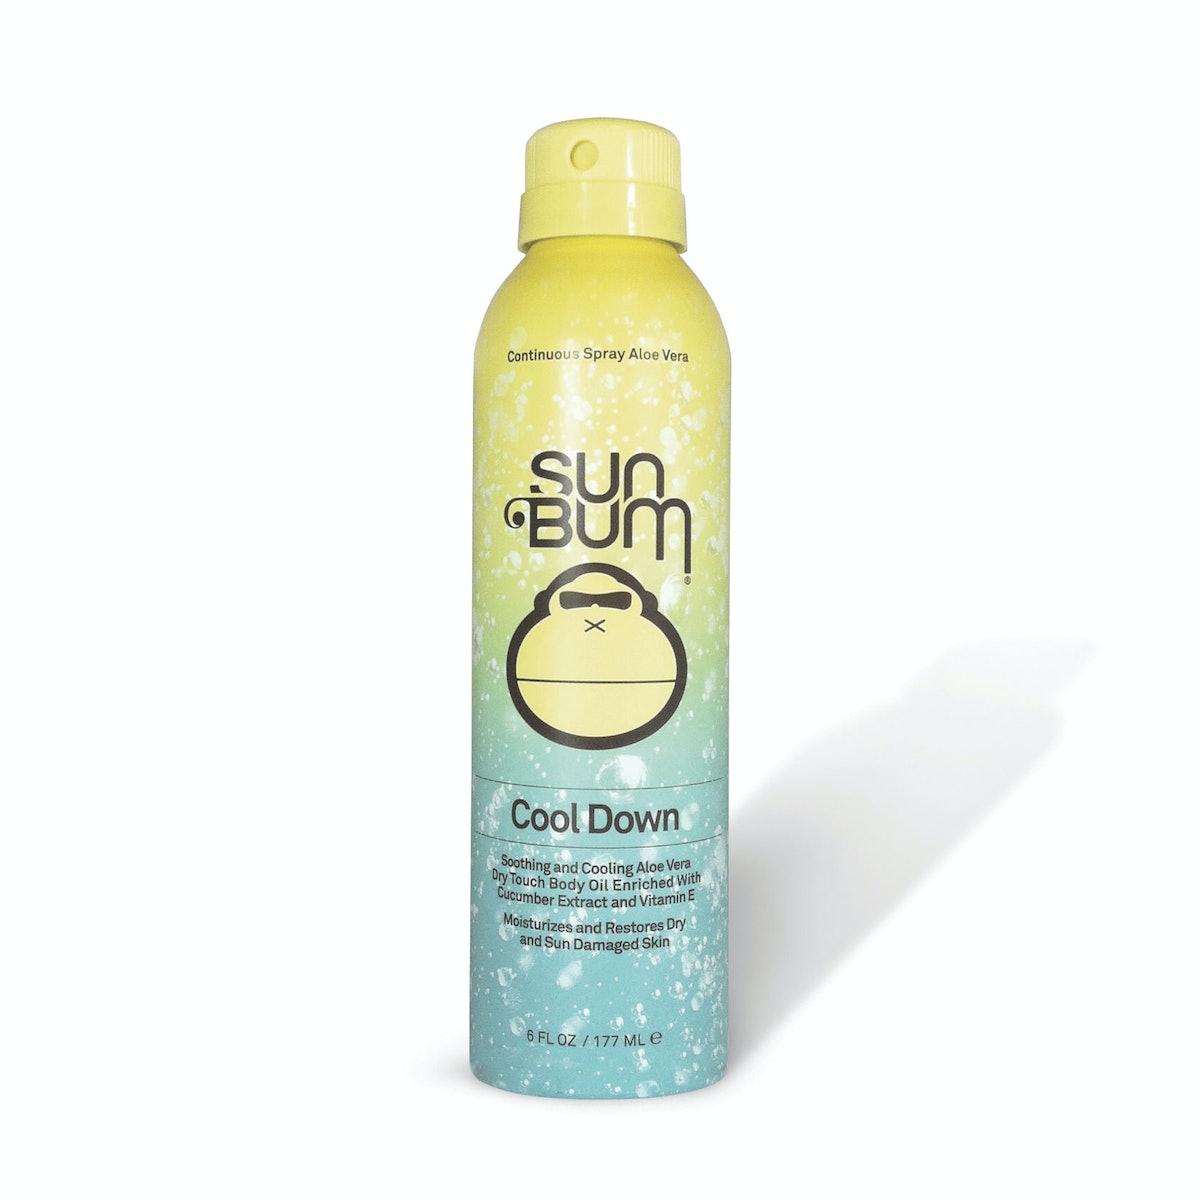 Sun Bum Cool Down Aloe Spray